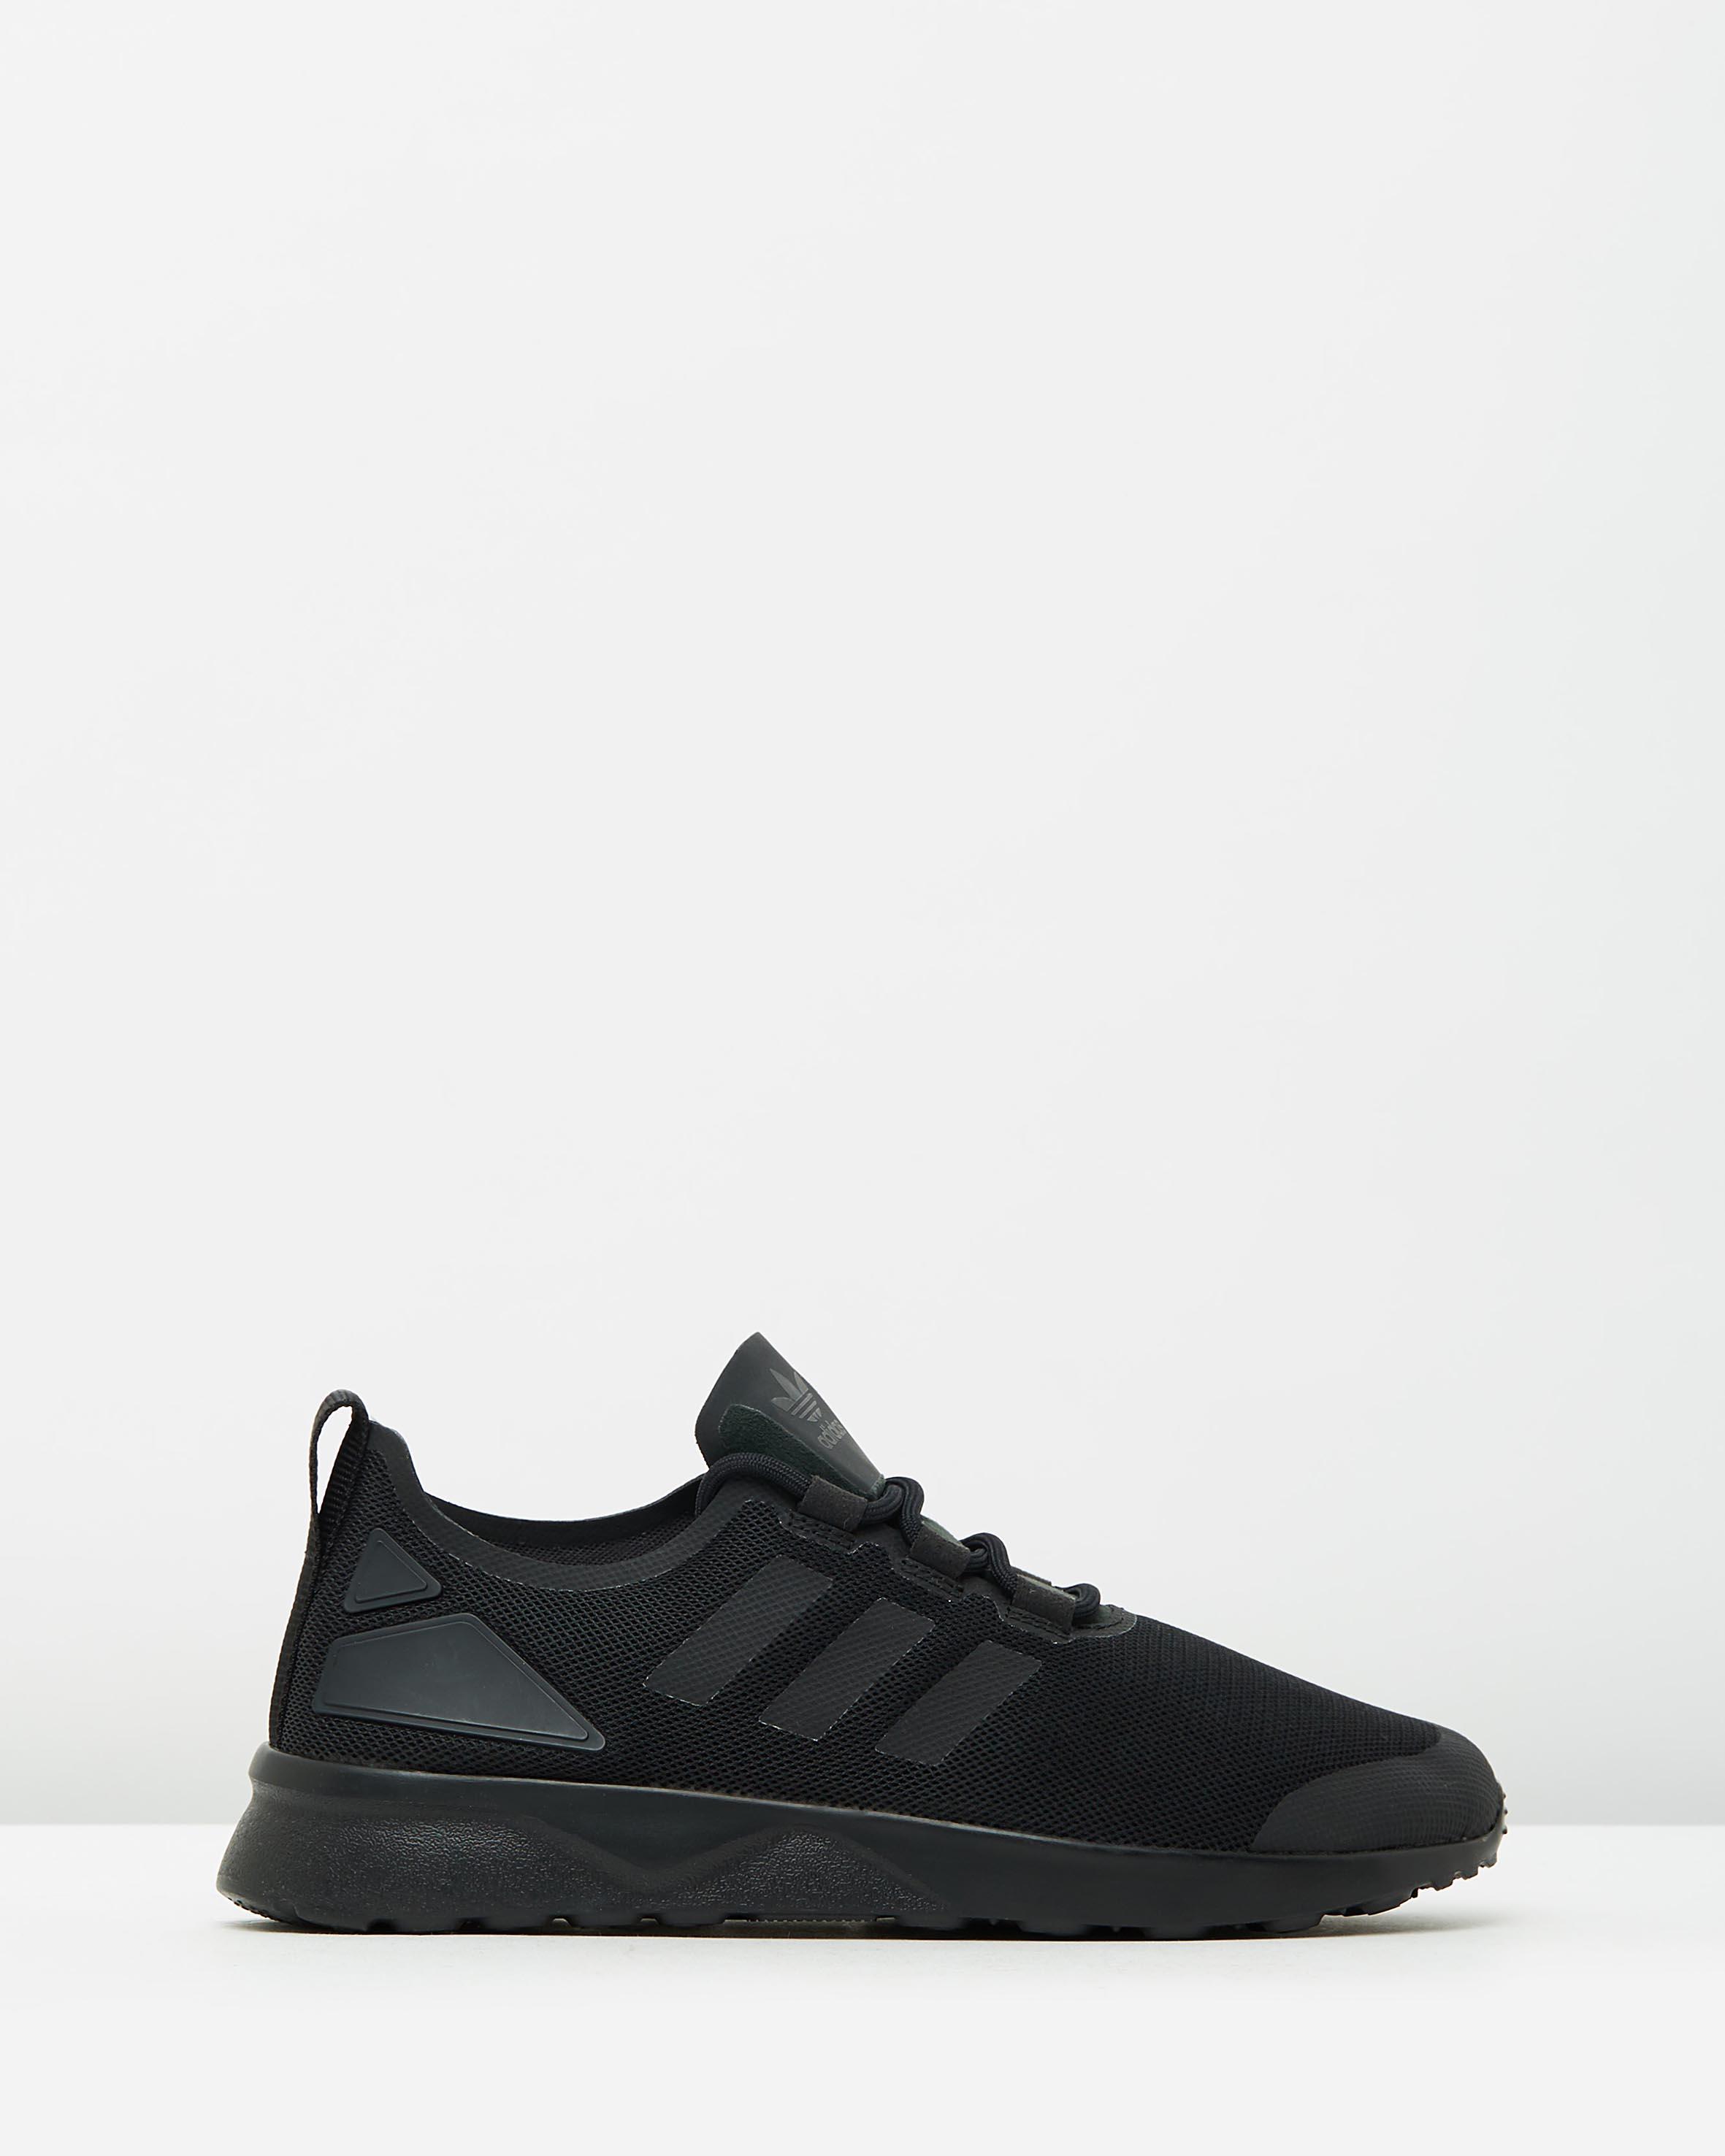 2b819cf19b38e Adidas Womens ZX Flux Adv Verve W Black 1 ...